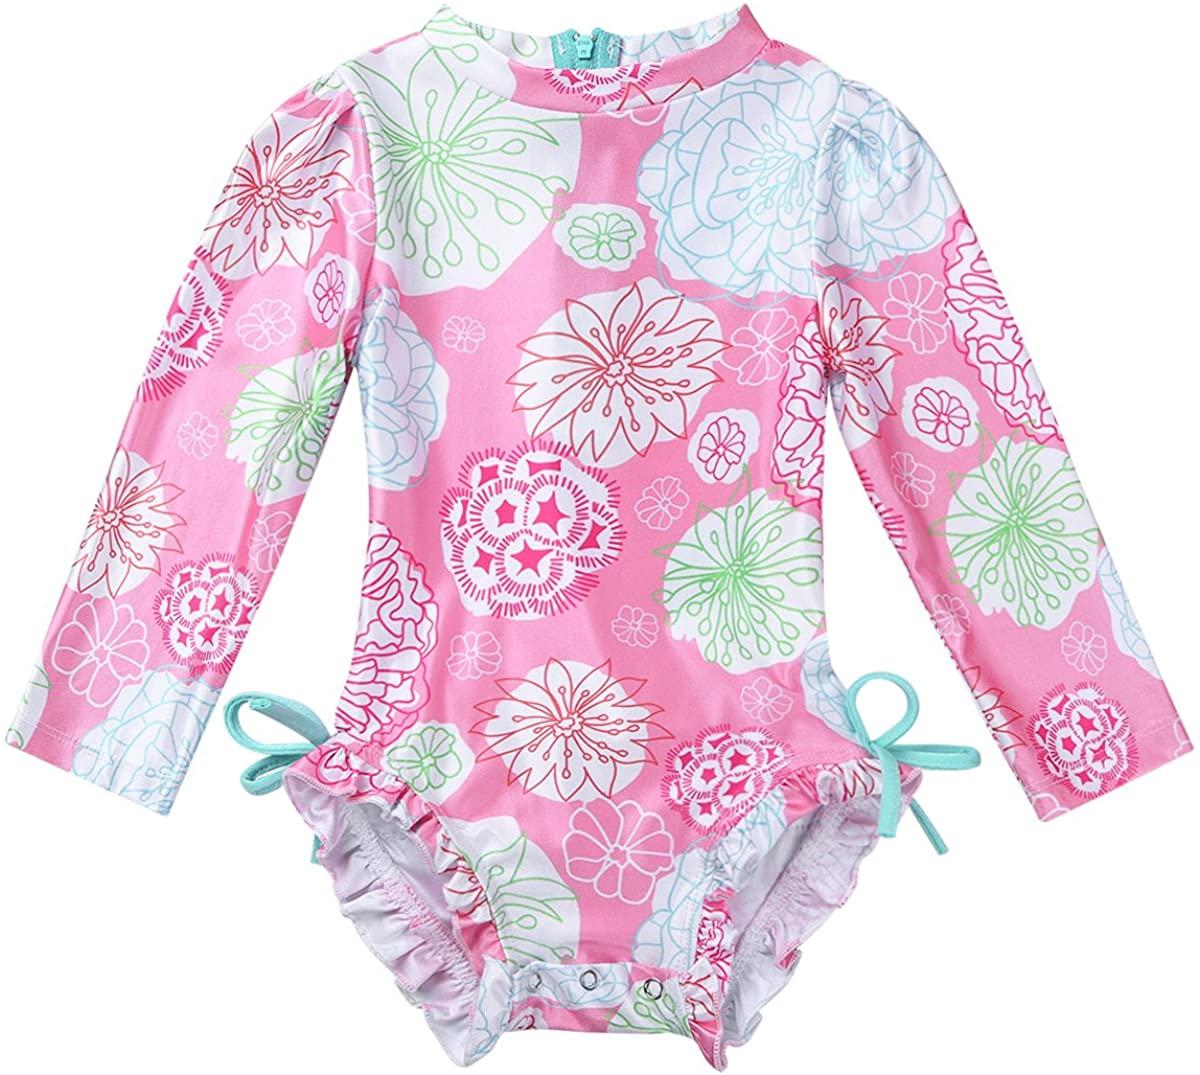 JanJean Baby Toddler Girls Swimsuit Rash Guard Flower Swimwear Long Sleeve One-Piece Sun Protection